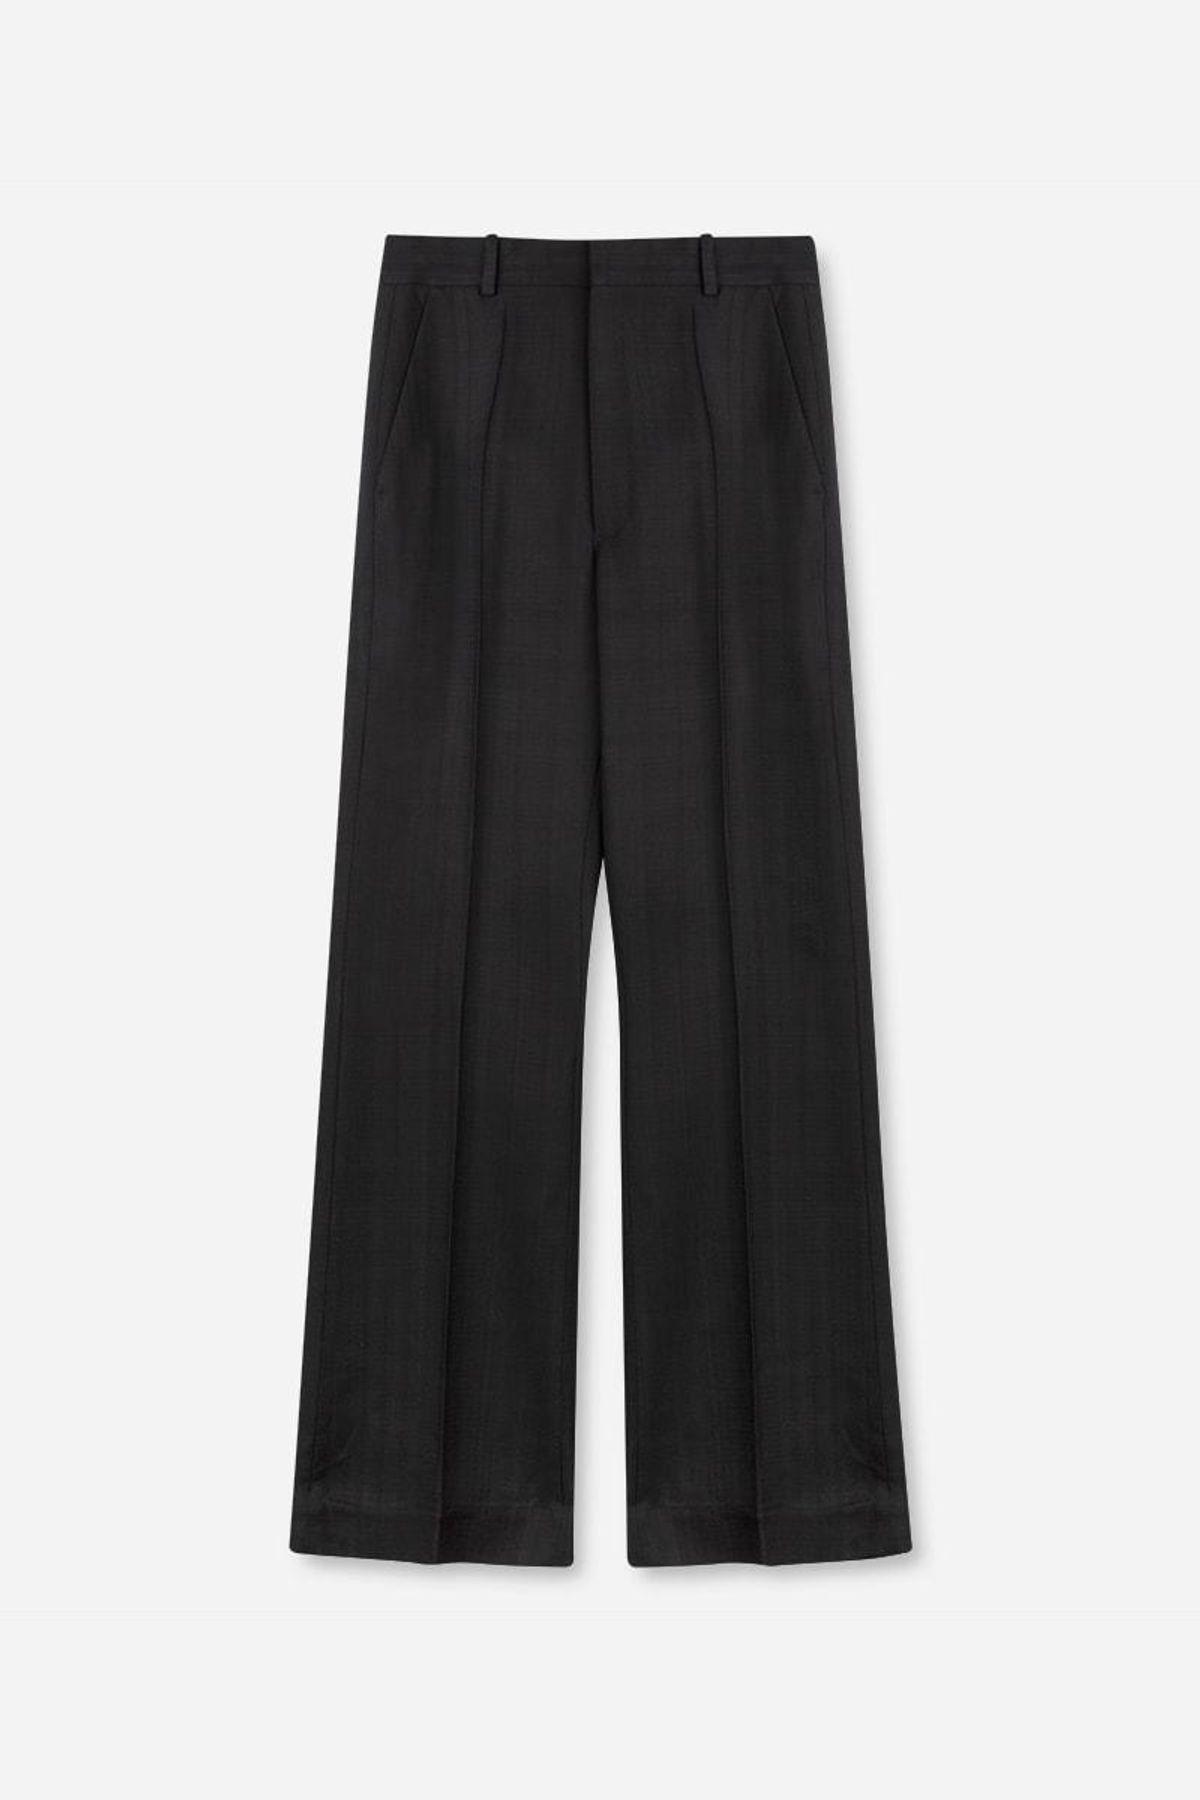 Sagal Fluid Viscose Wool Trouser